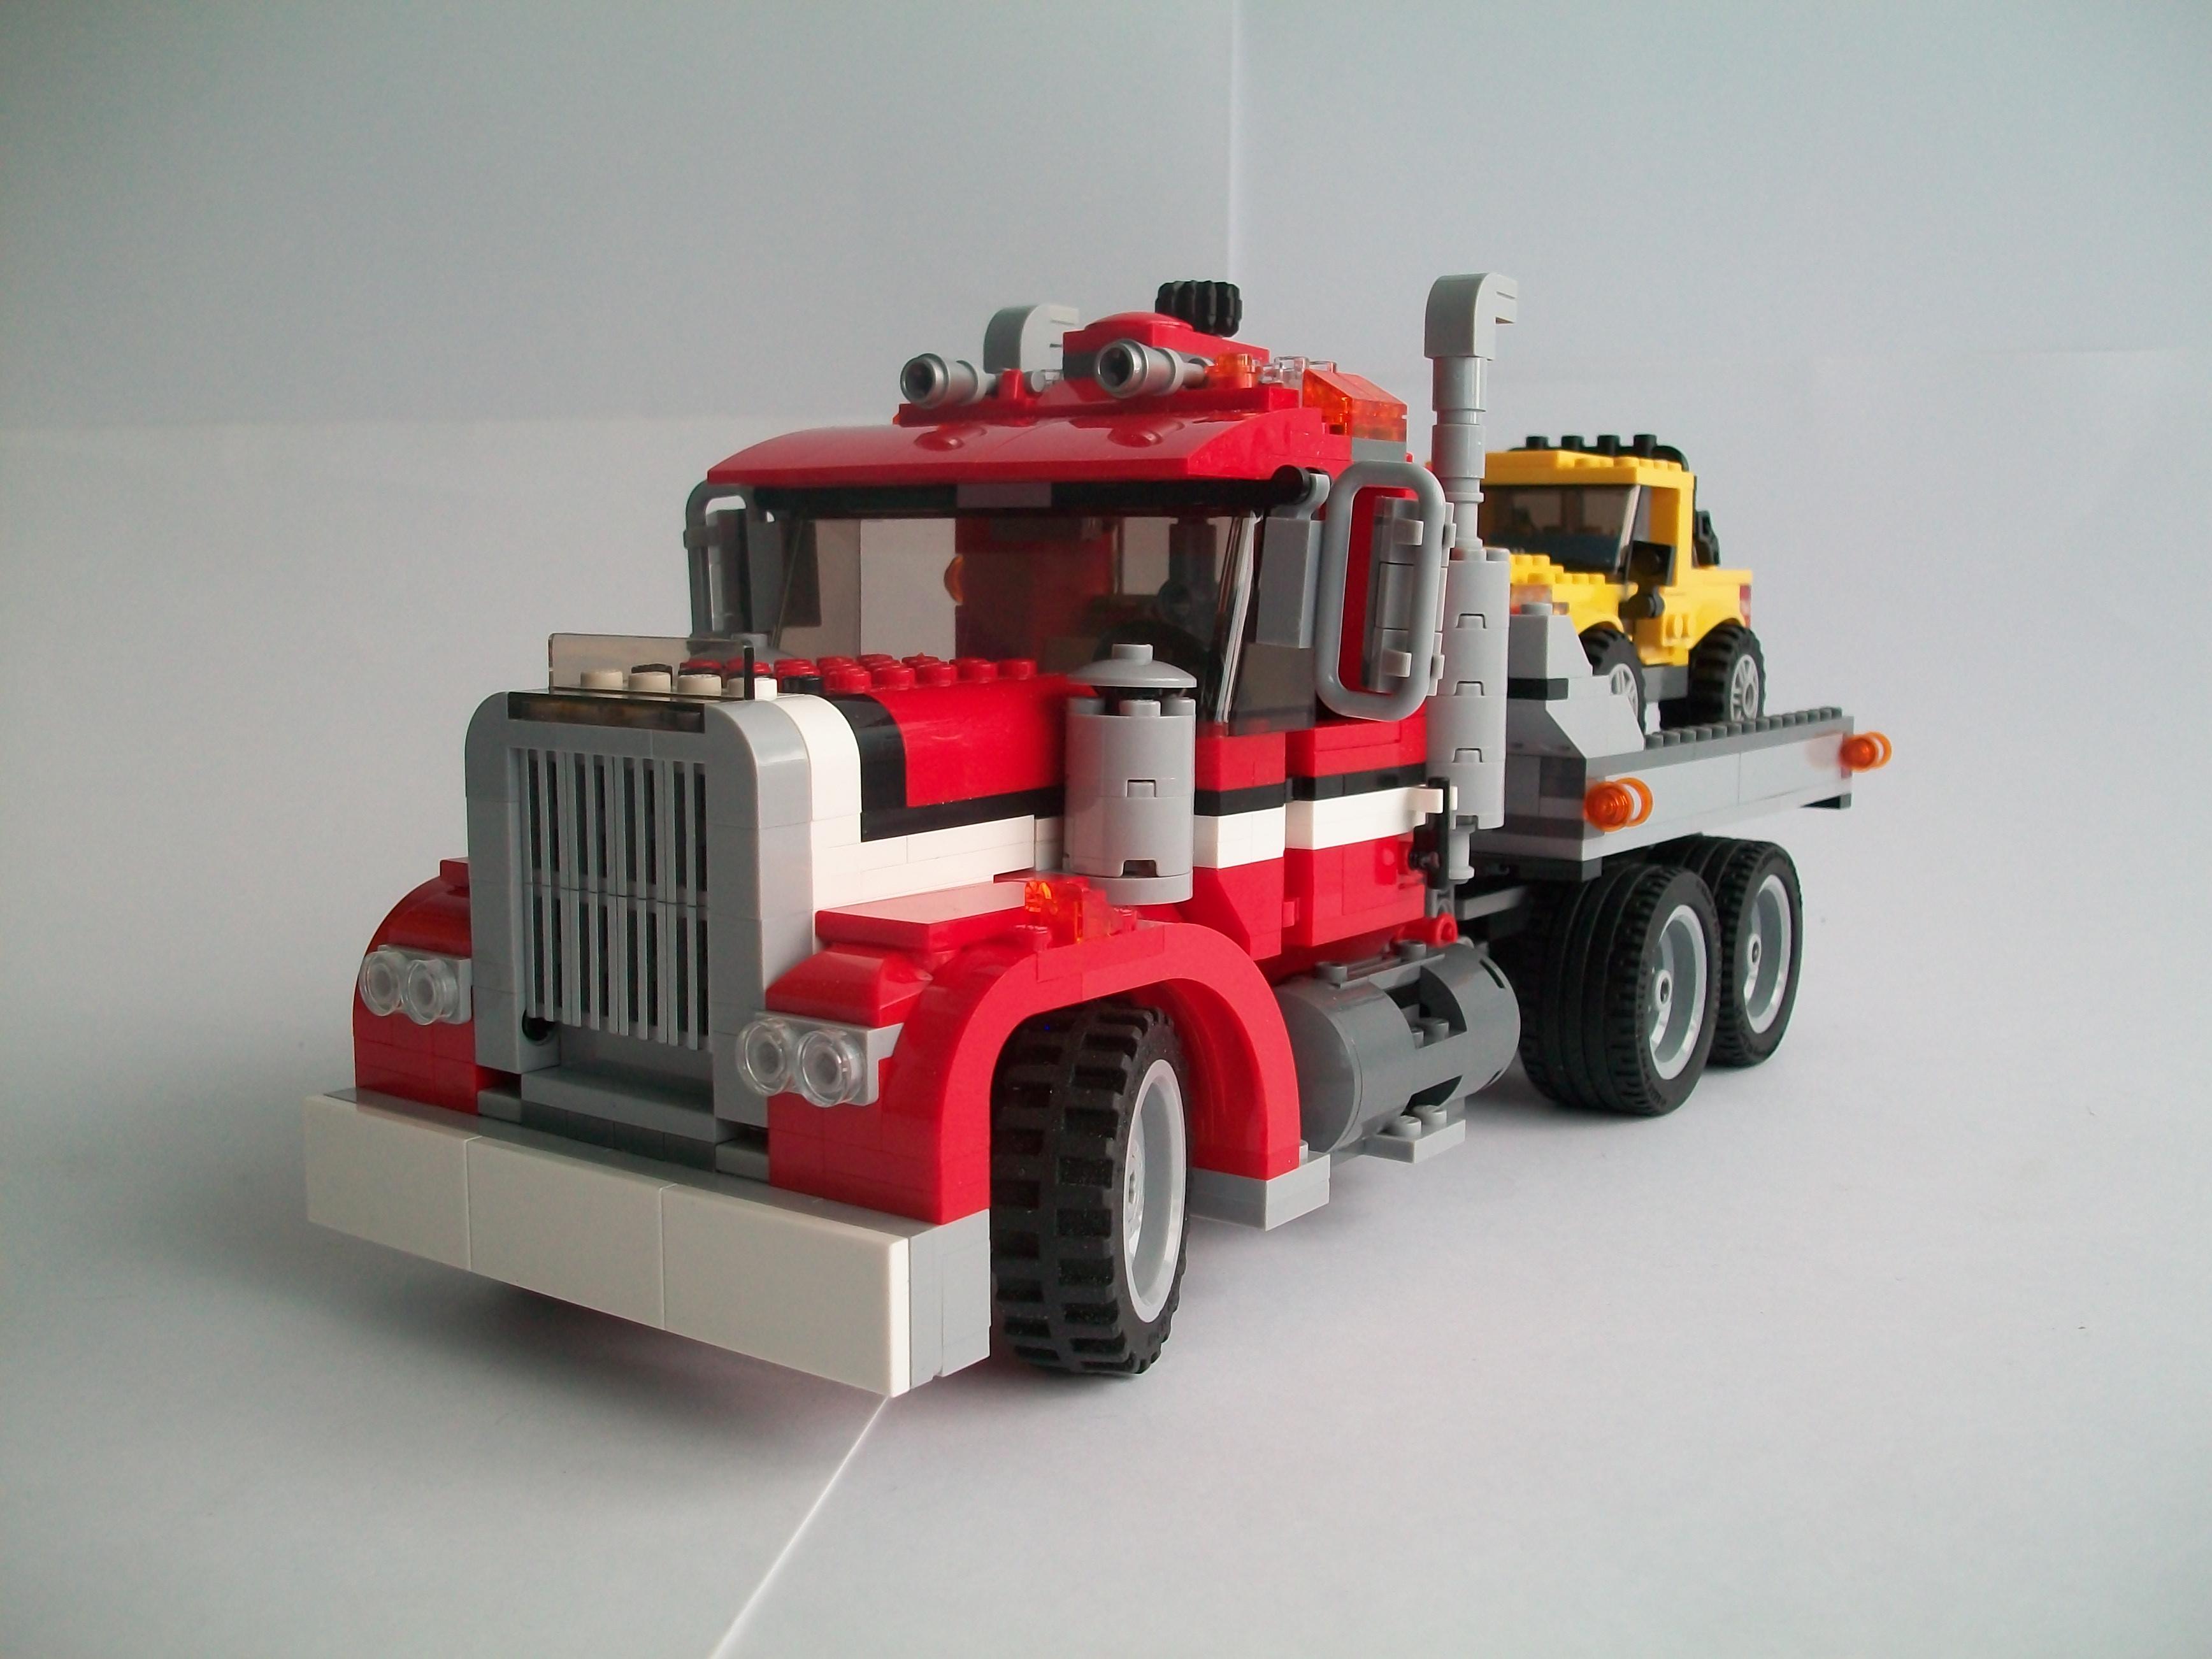 lego model team 5590 instructions